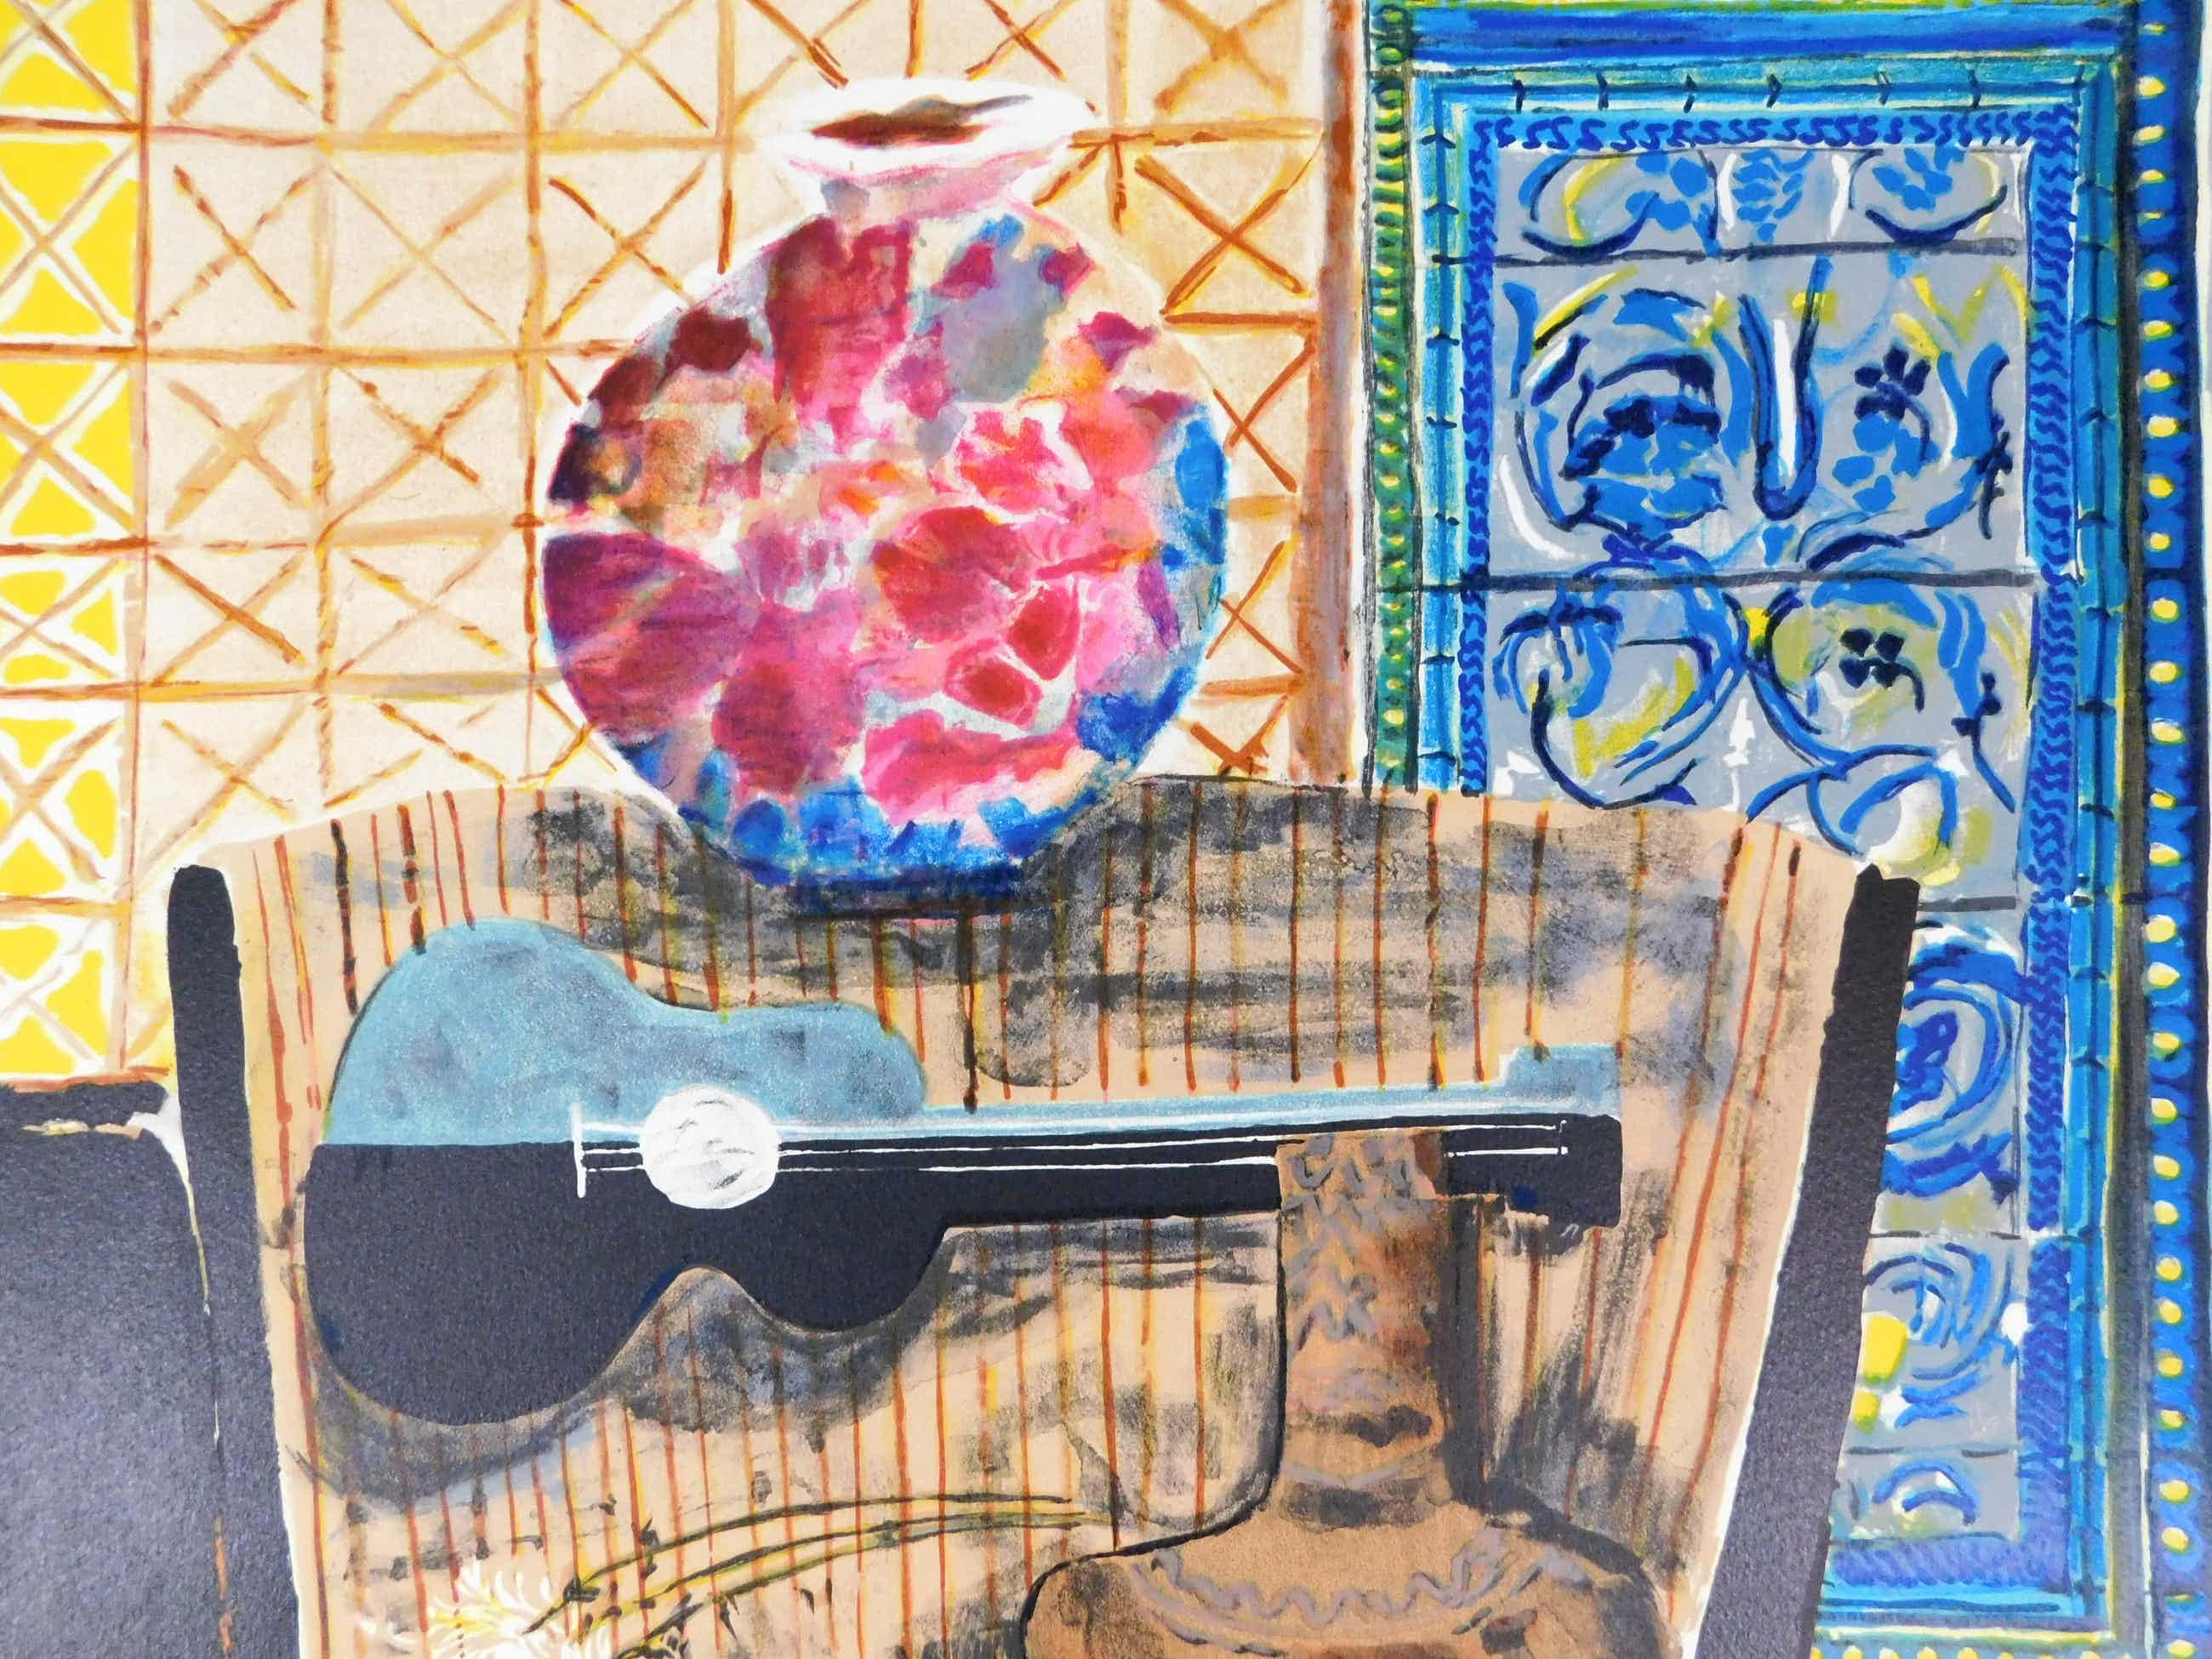 Wendy Chazin - Composition with Guitar and Vase kopen? Bied vanaf 23!